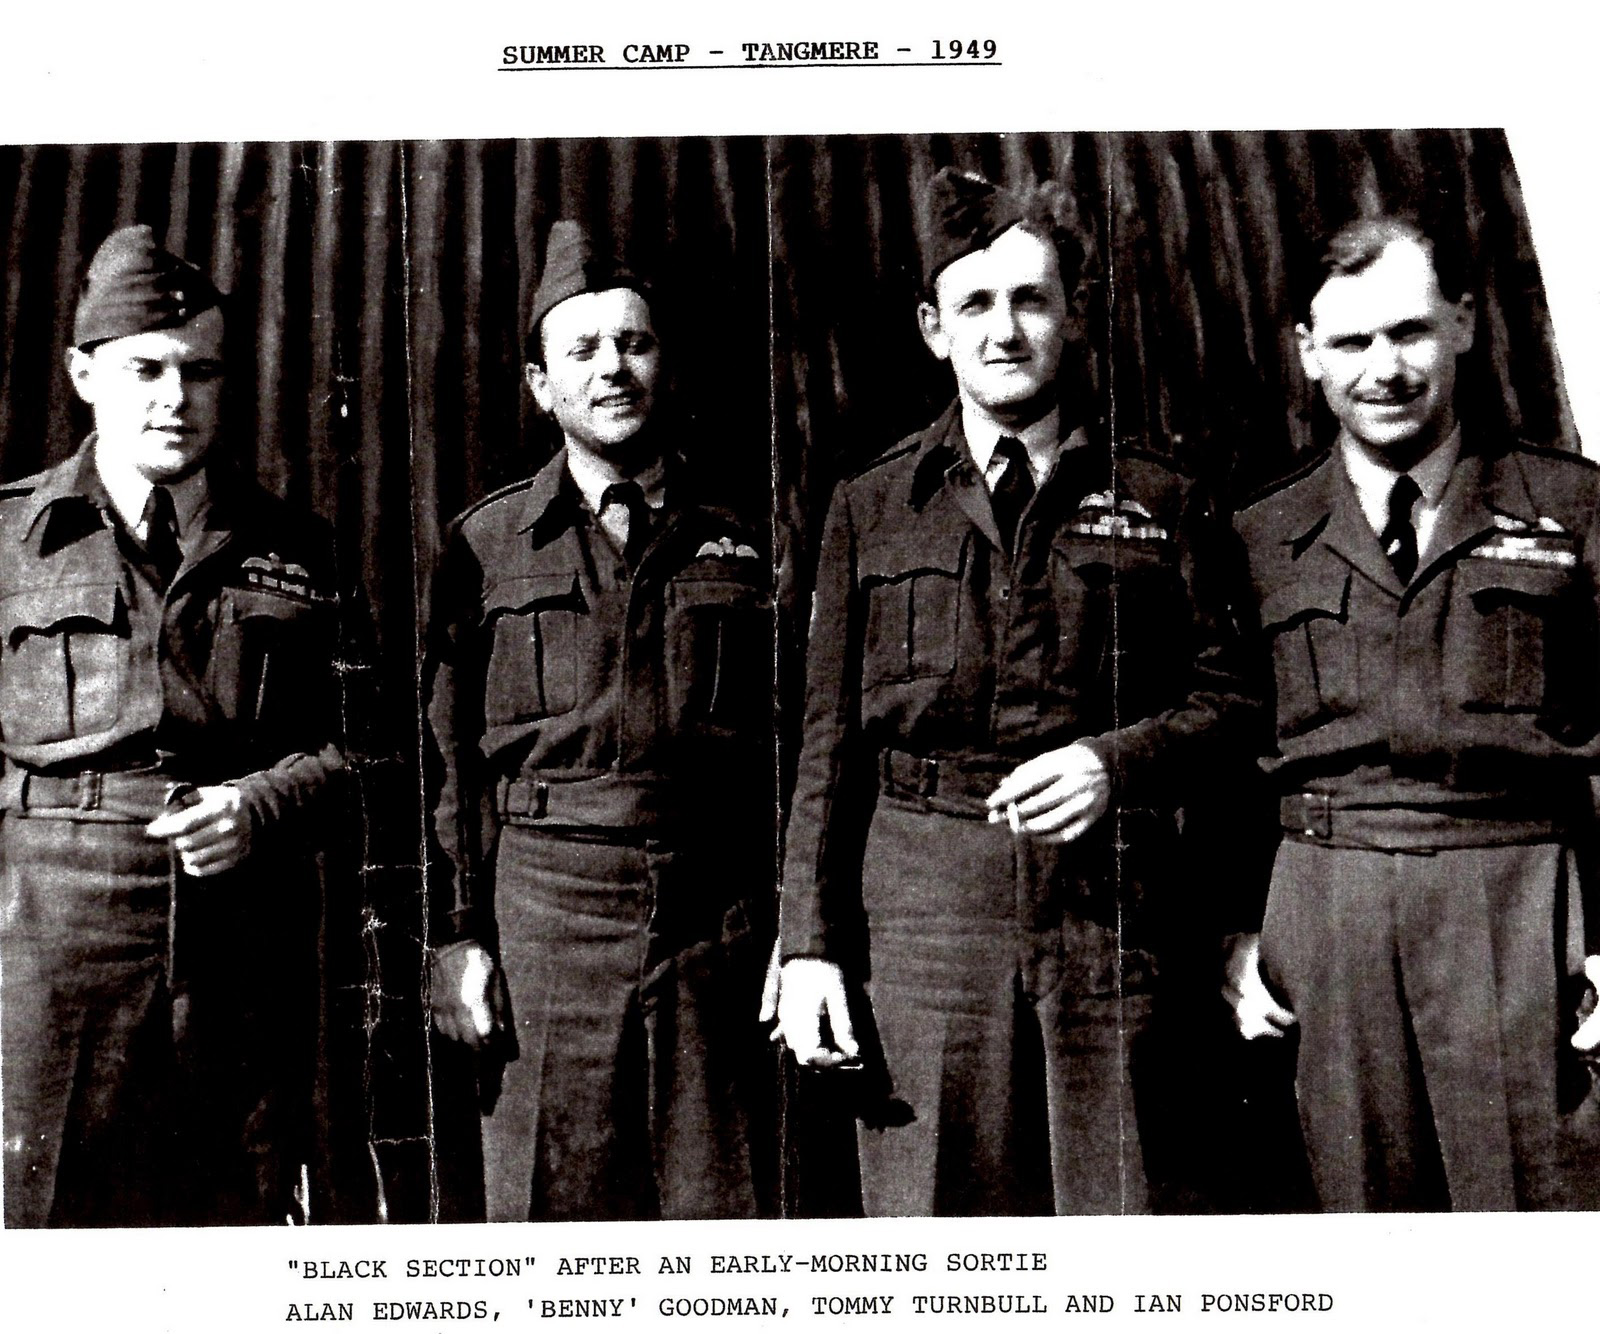 Benny Goodman with his crew